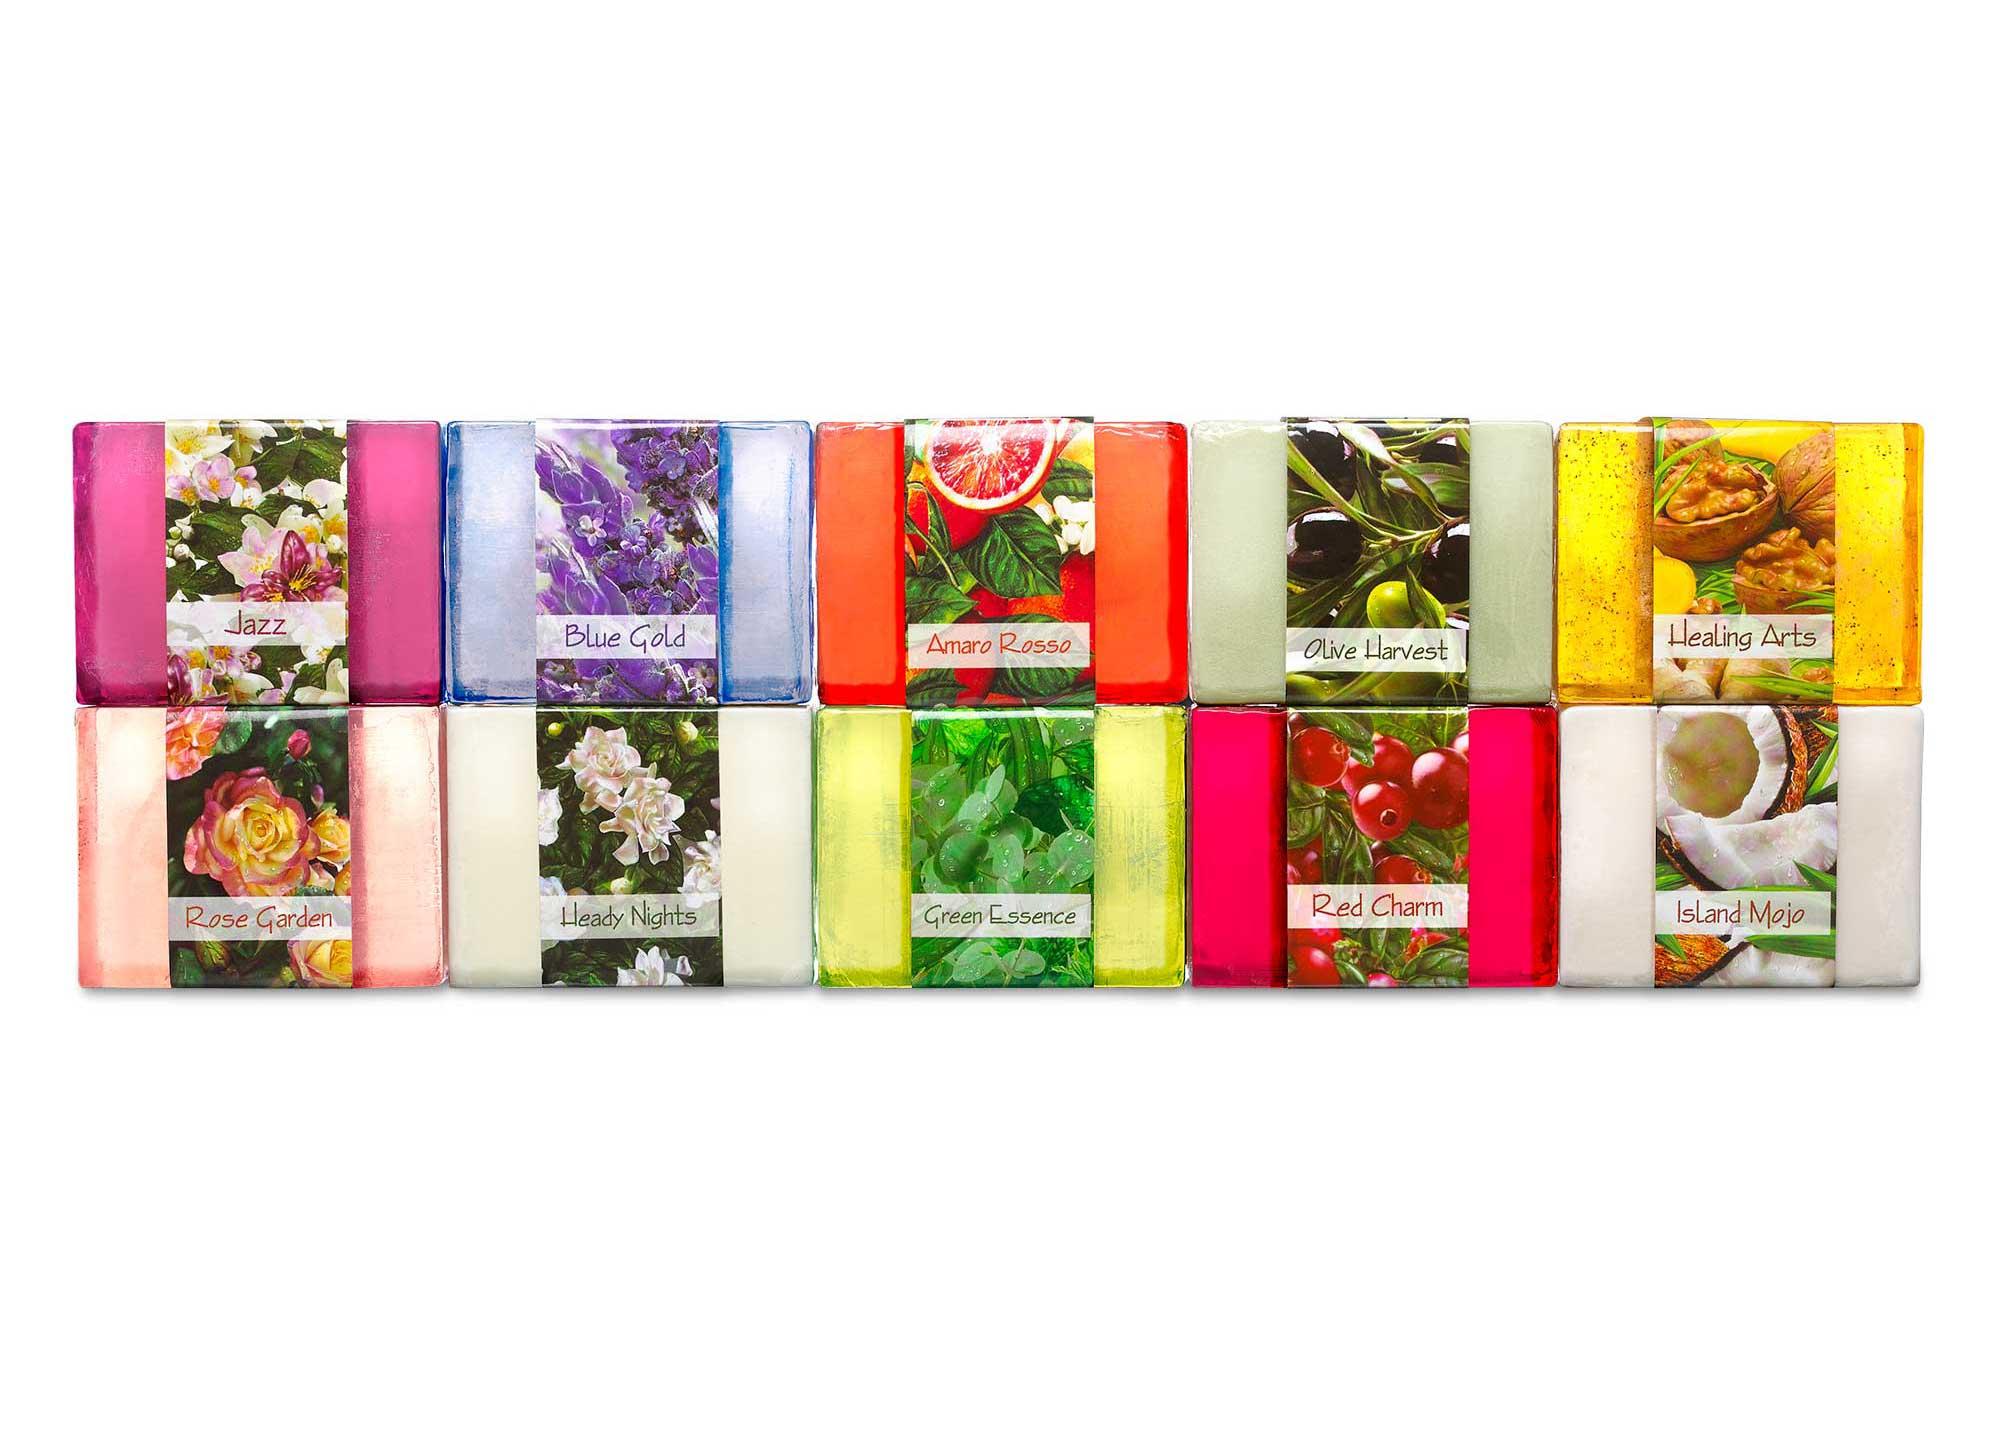 10 of Nabila K's Bar Soaps in different scents